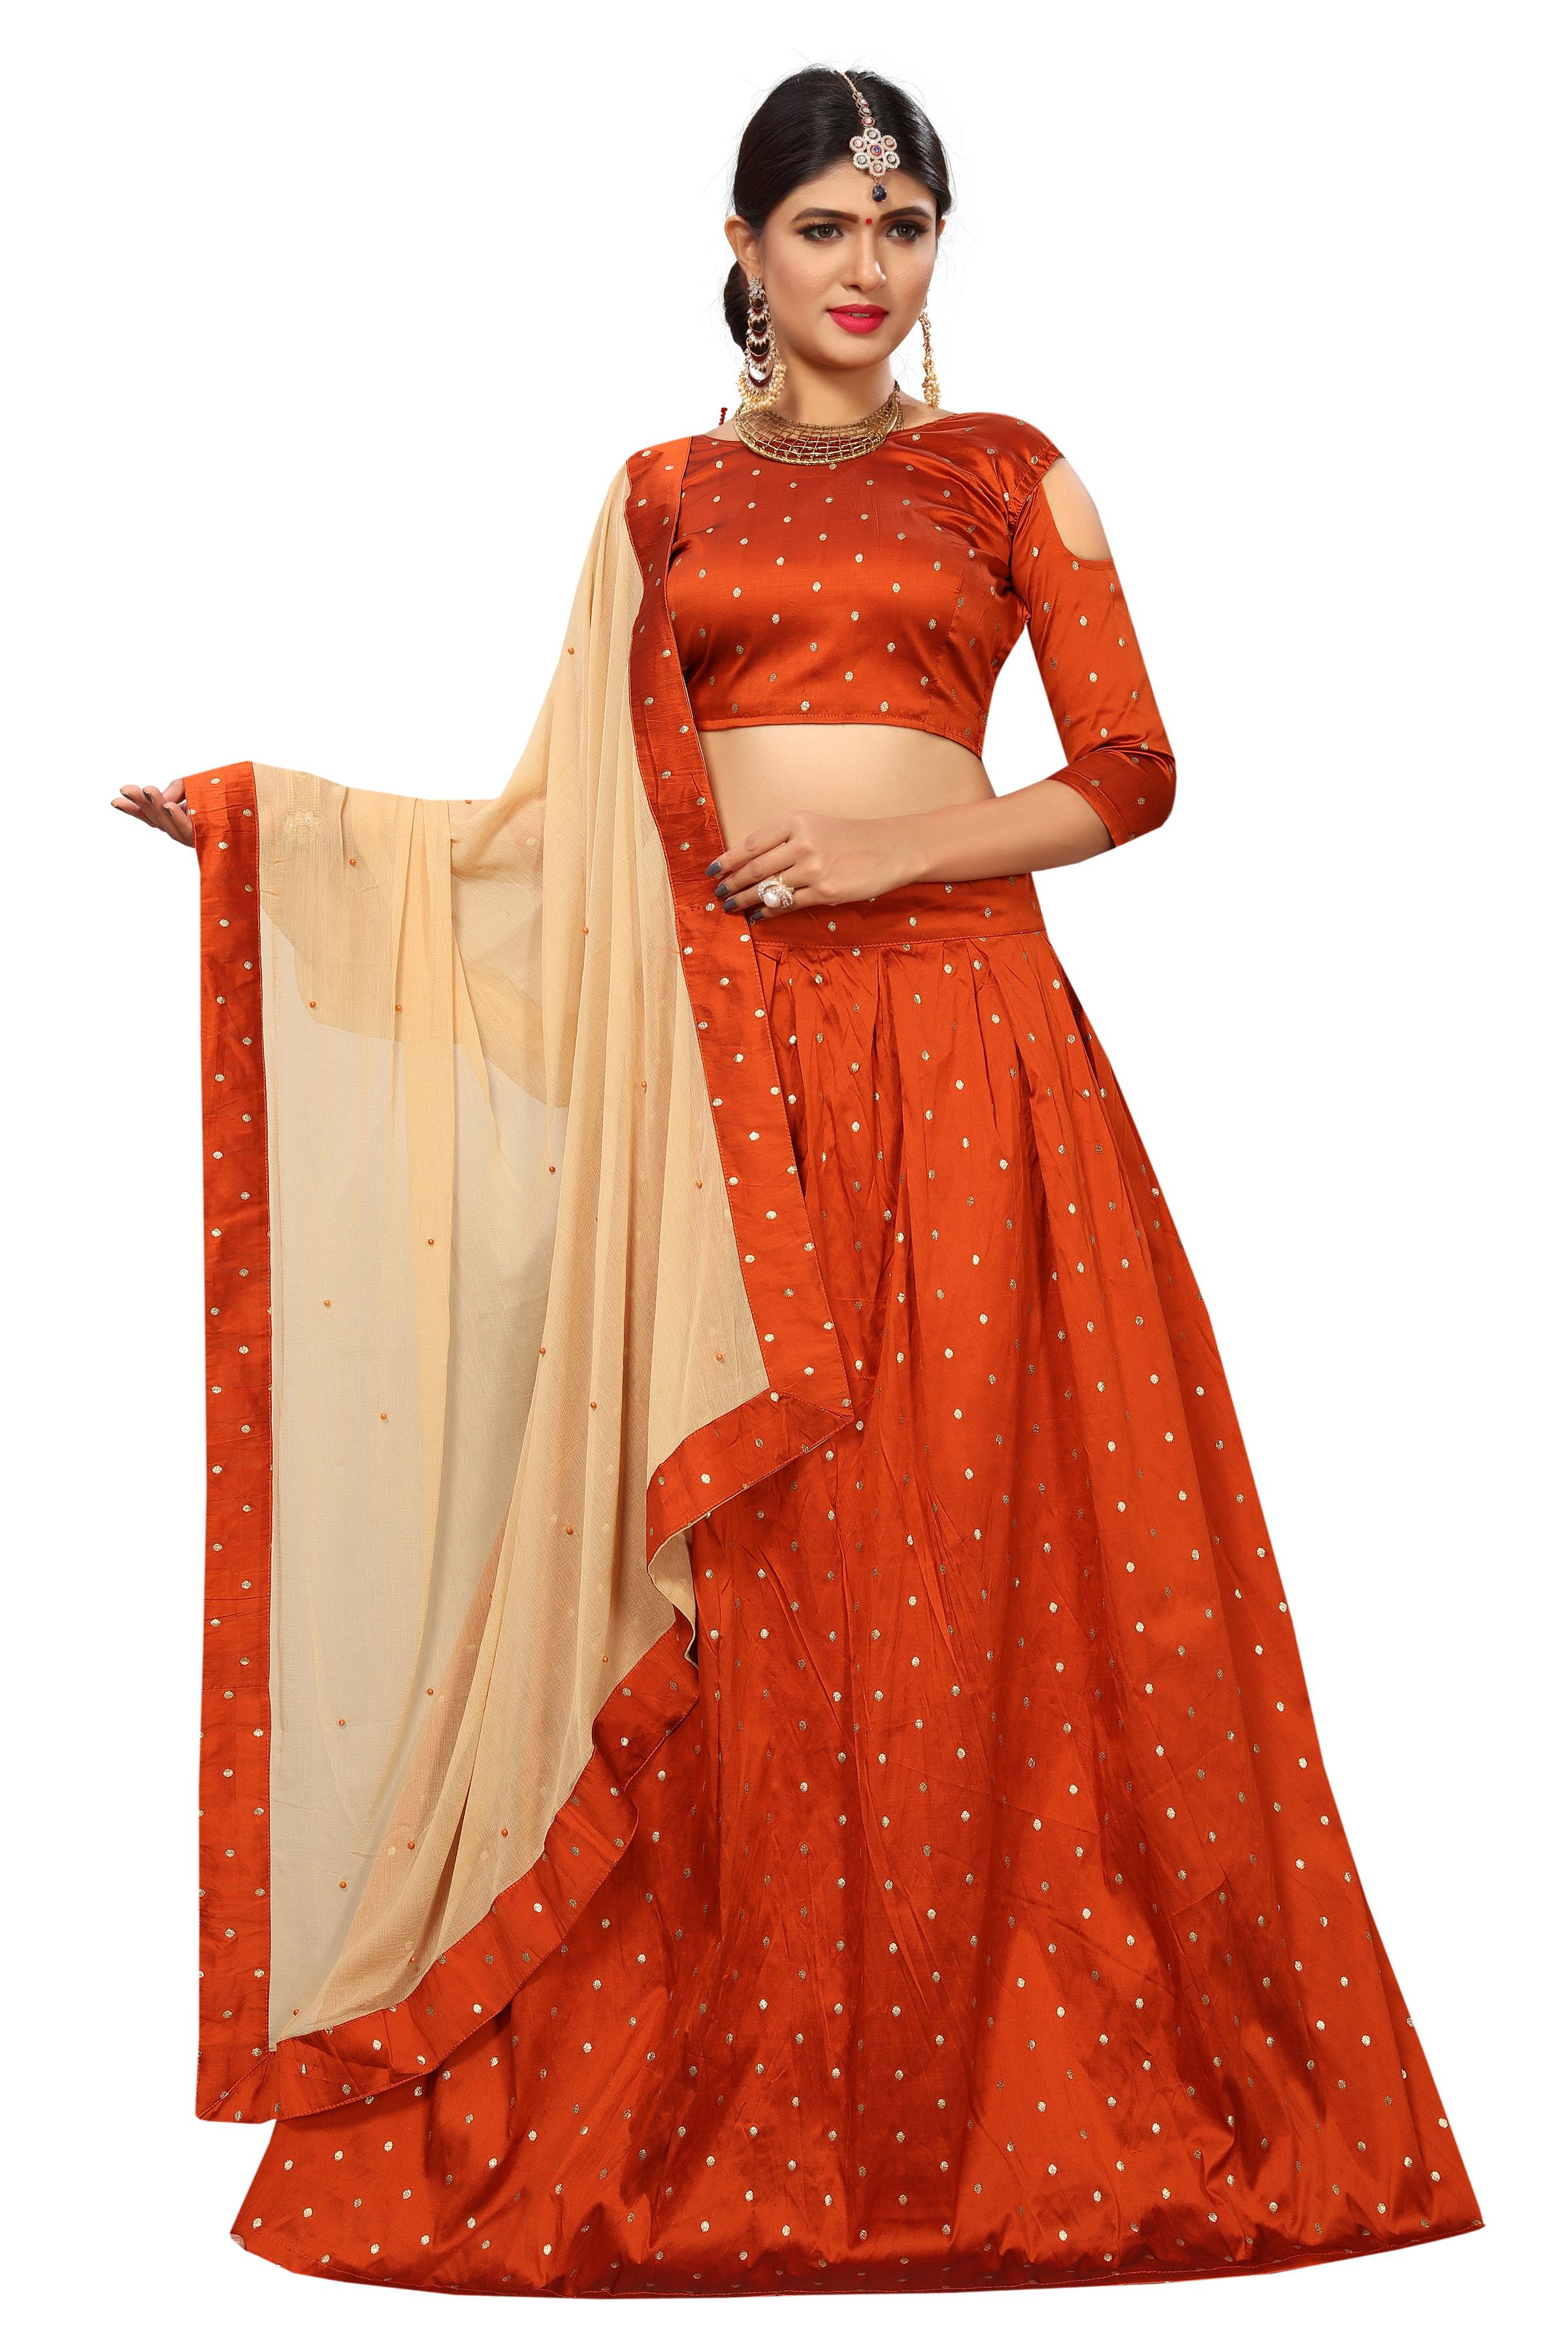 d2db6bad0bb9e9 Orange lehengas online buy orange color lehenga designs discounted prices  jpg 2400x3600 Orange long top lehenga